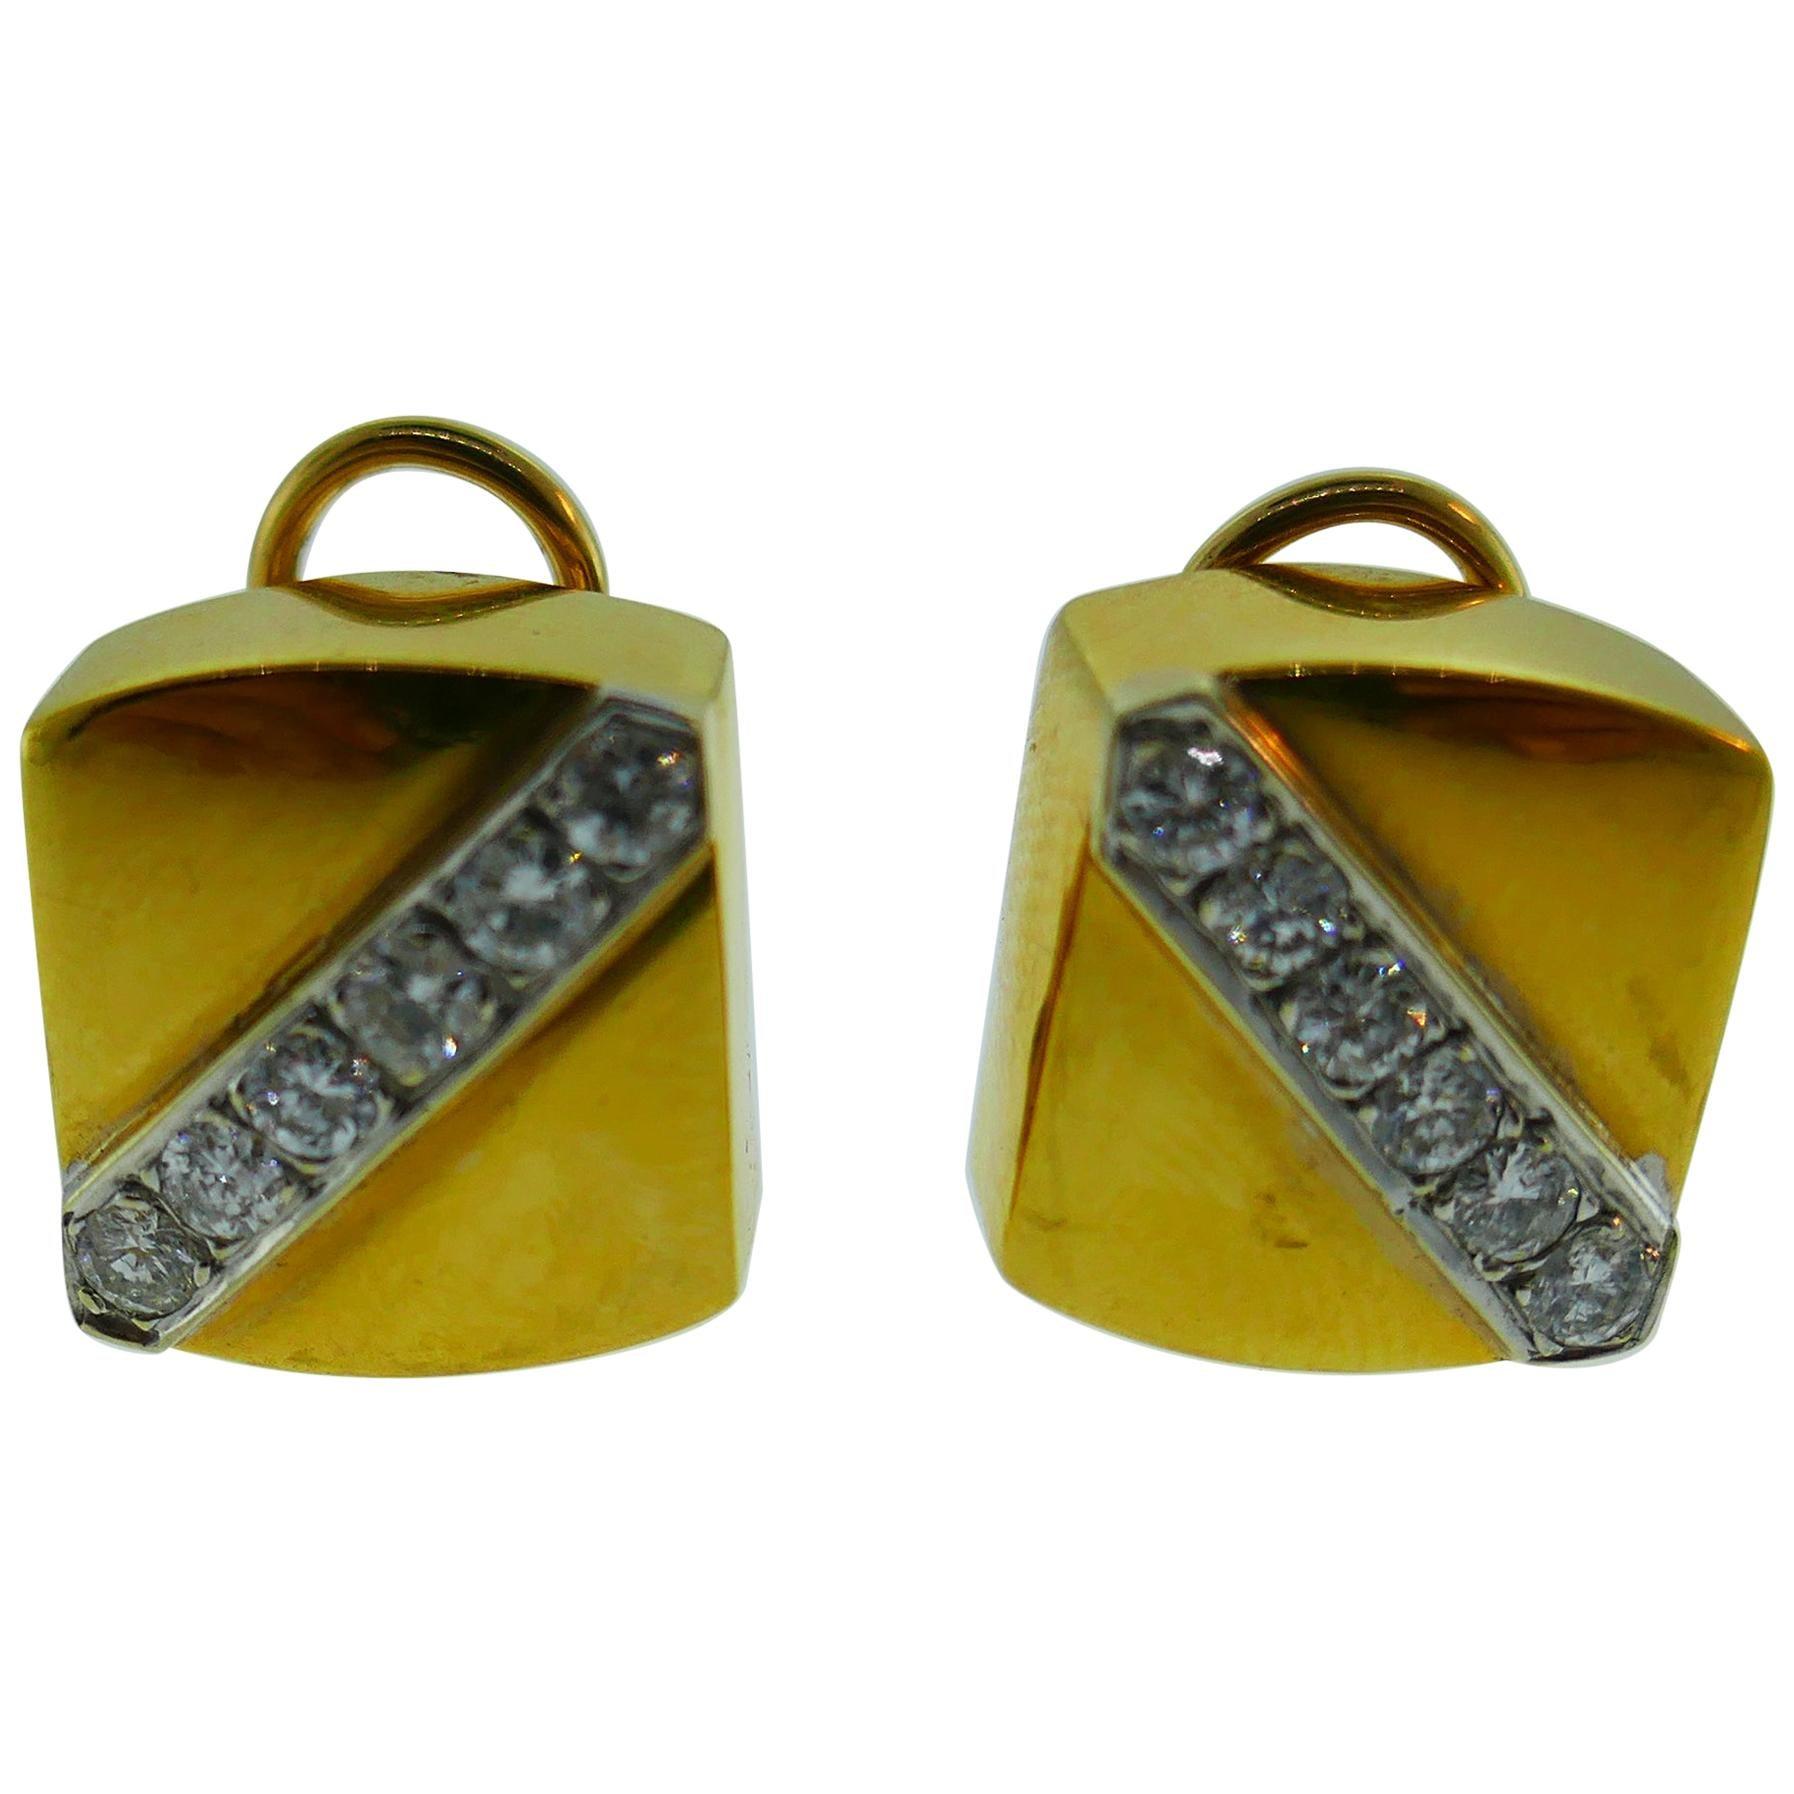 Cartier Aldo Cipullo 18 Karat Yellow Gold & Diamond Earrings circa 1971 Vintage